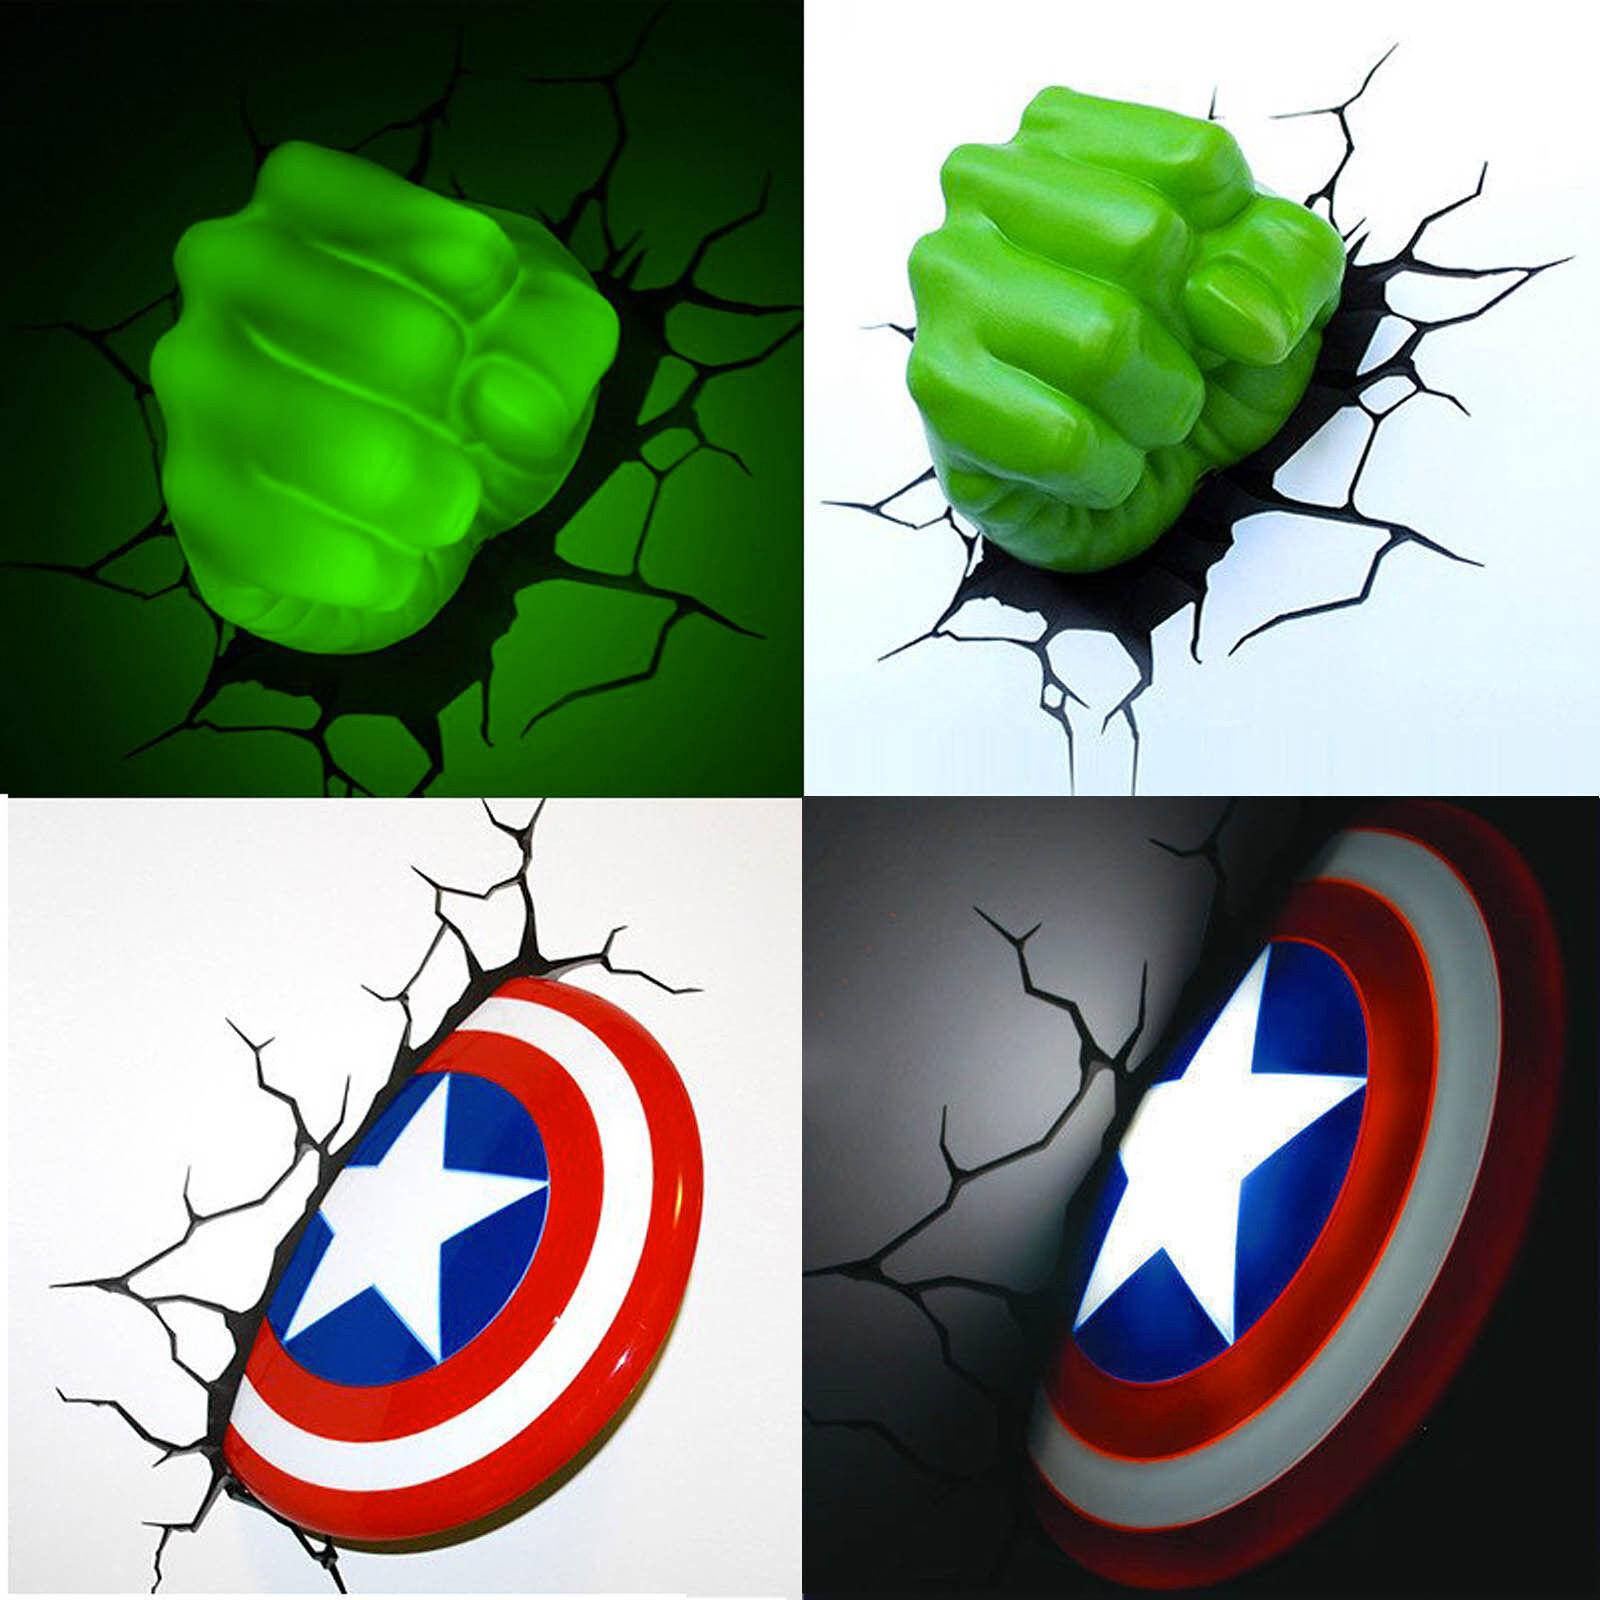 Marvel Vengadores Capitán América Escudo HULK FIST 3D Deco Wall LED luz de noche